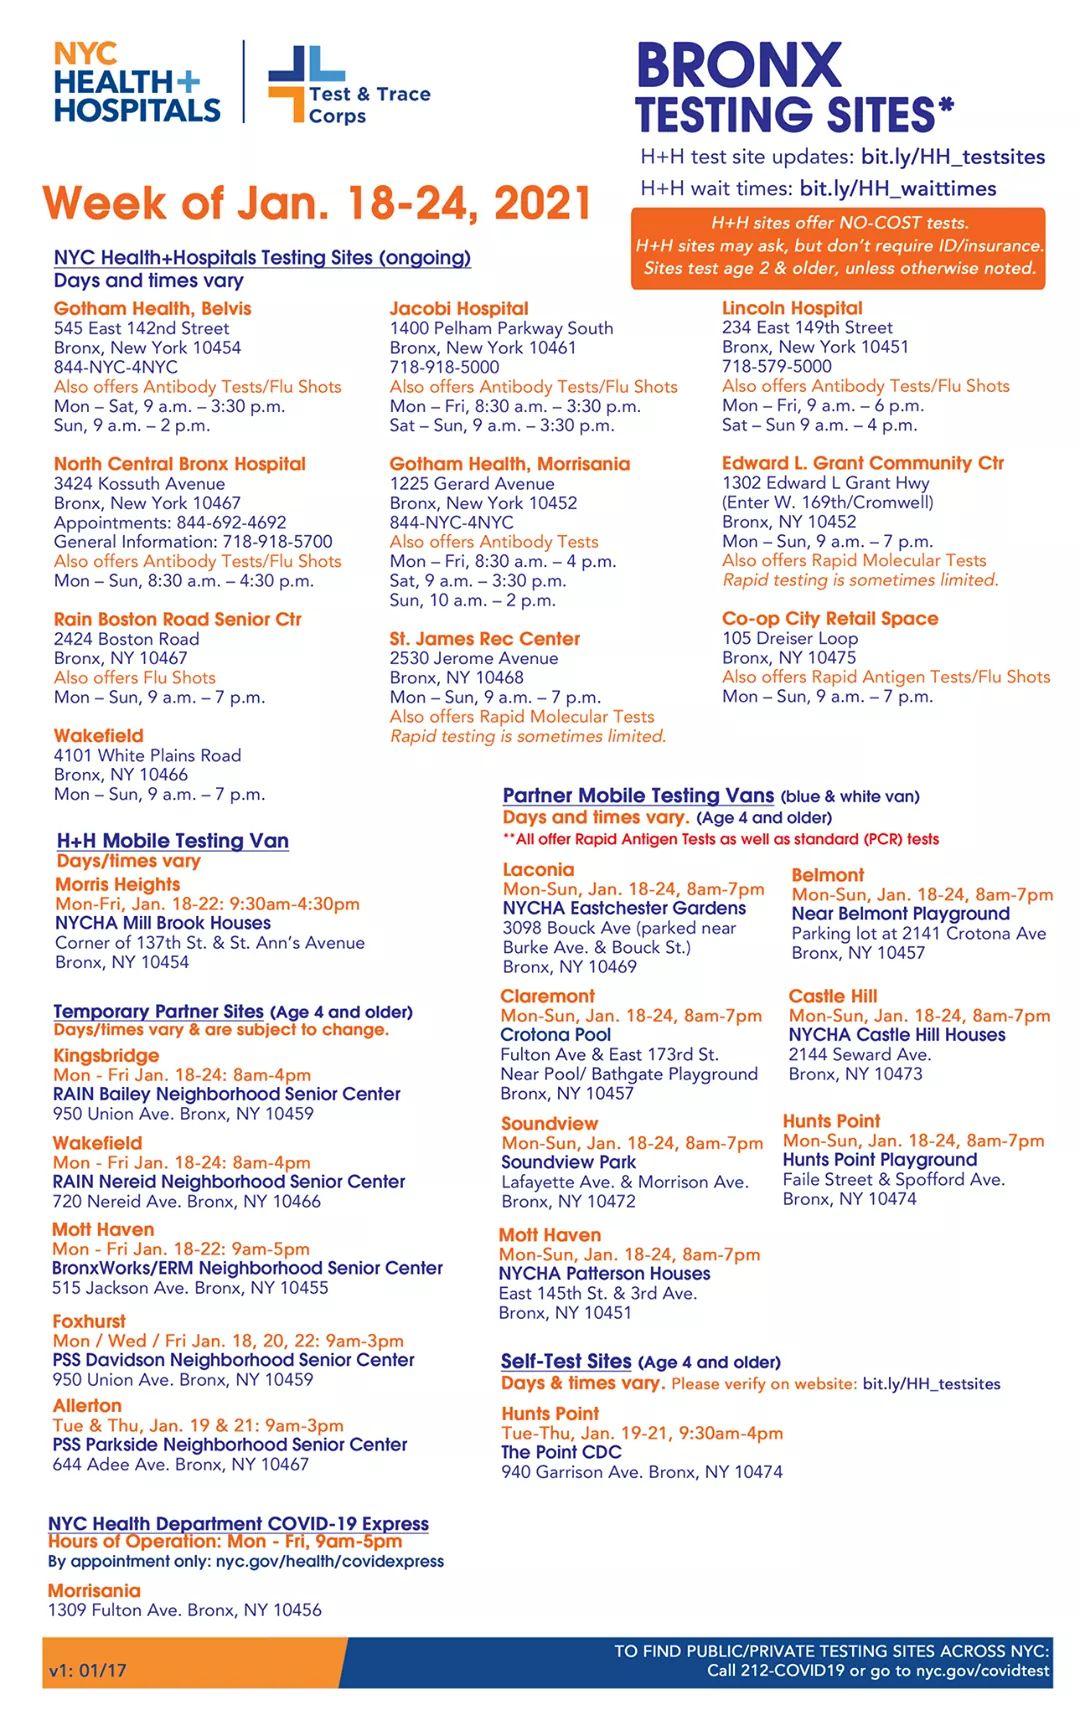 This Week's NYC Health + Hospitals Bronx Testing Sites